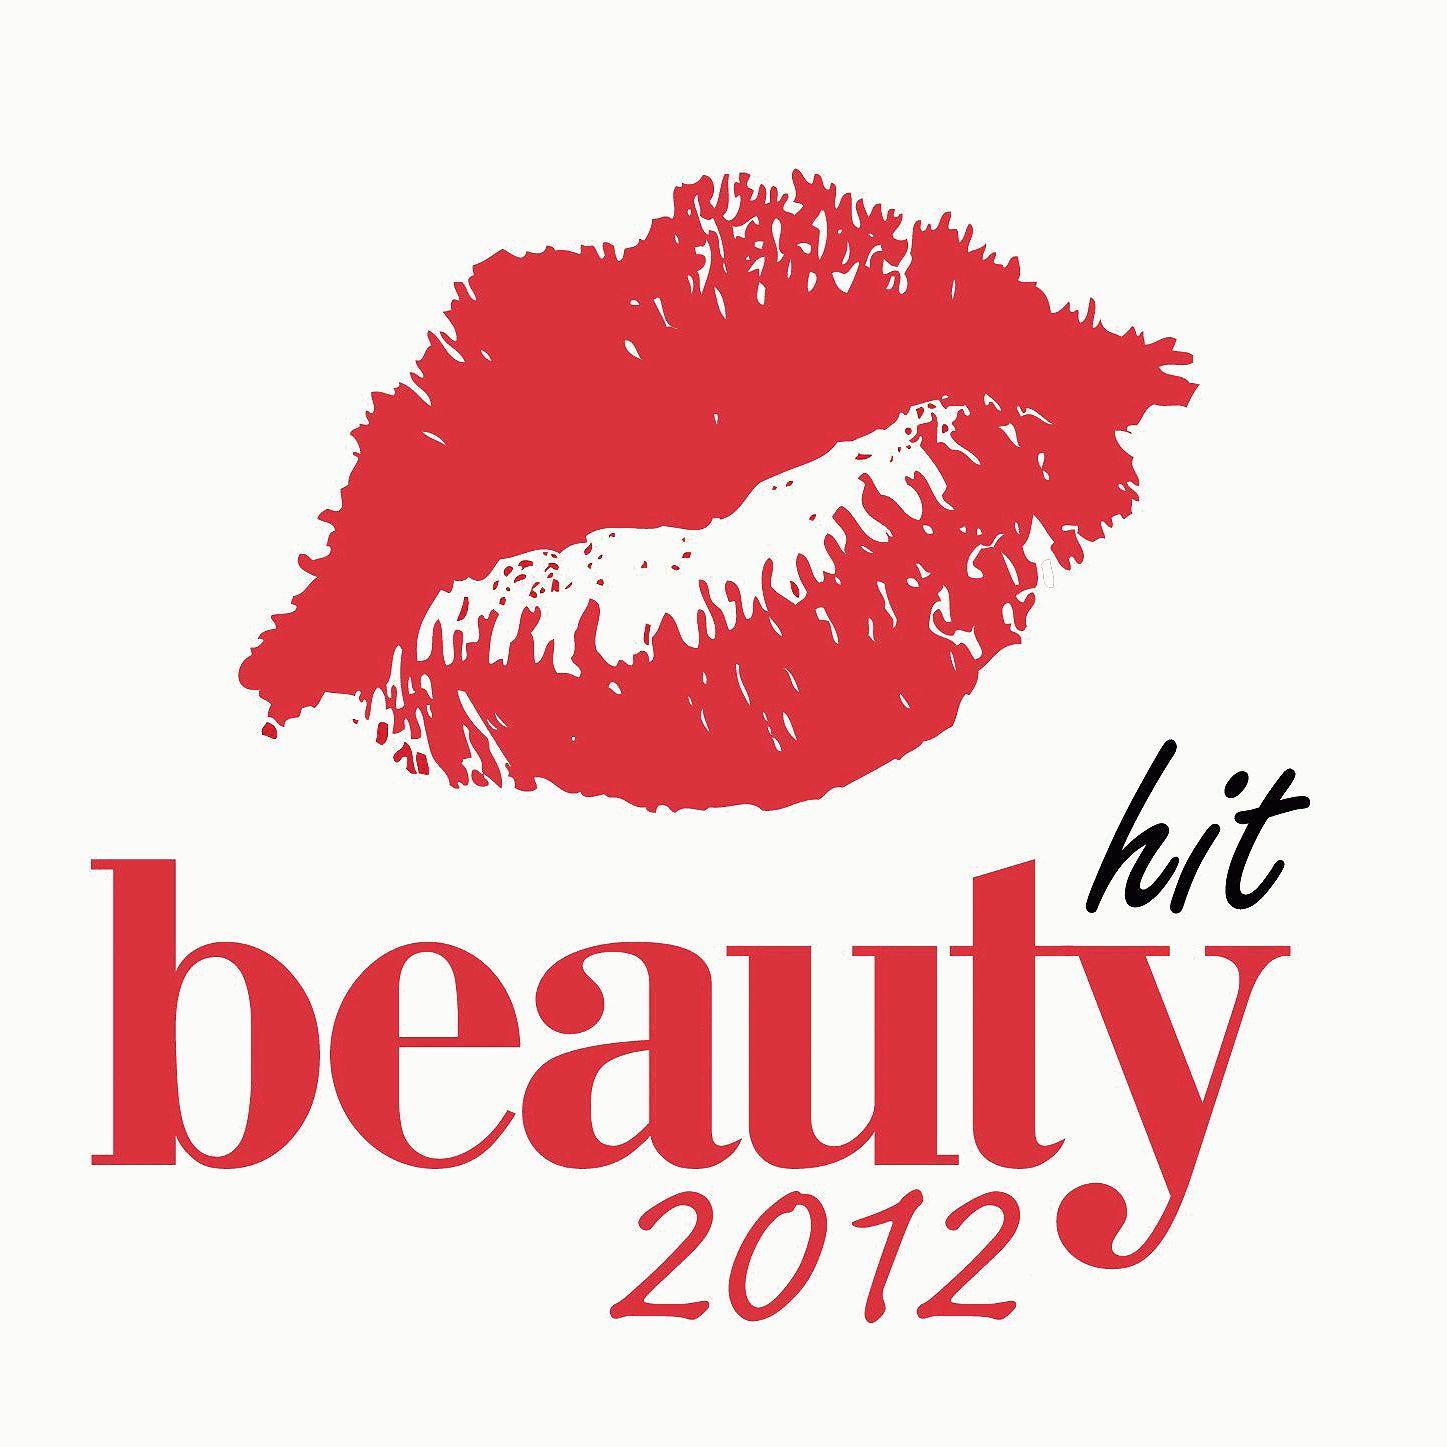 beauty hit